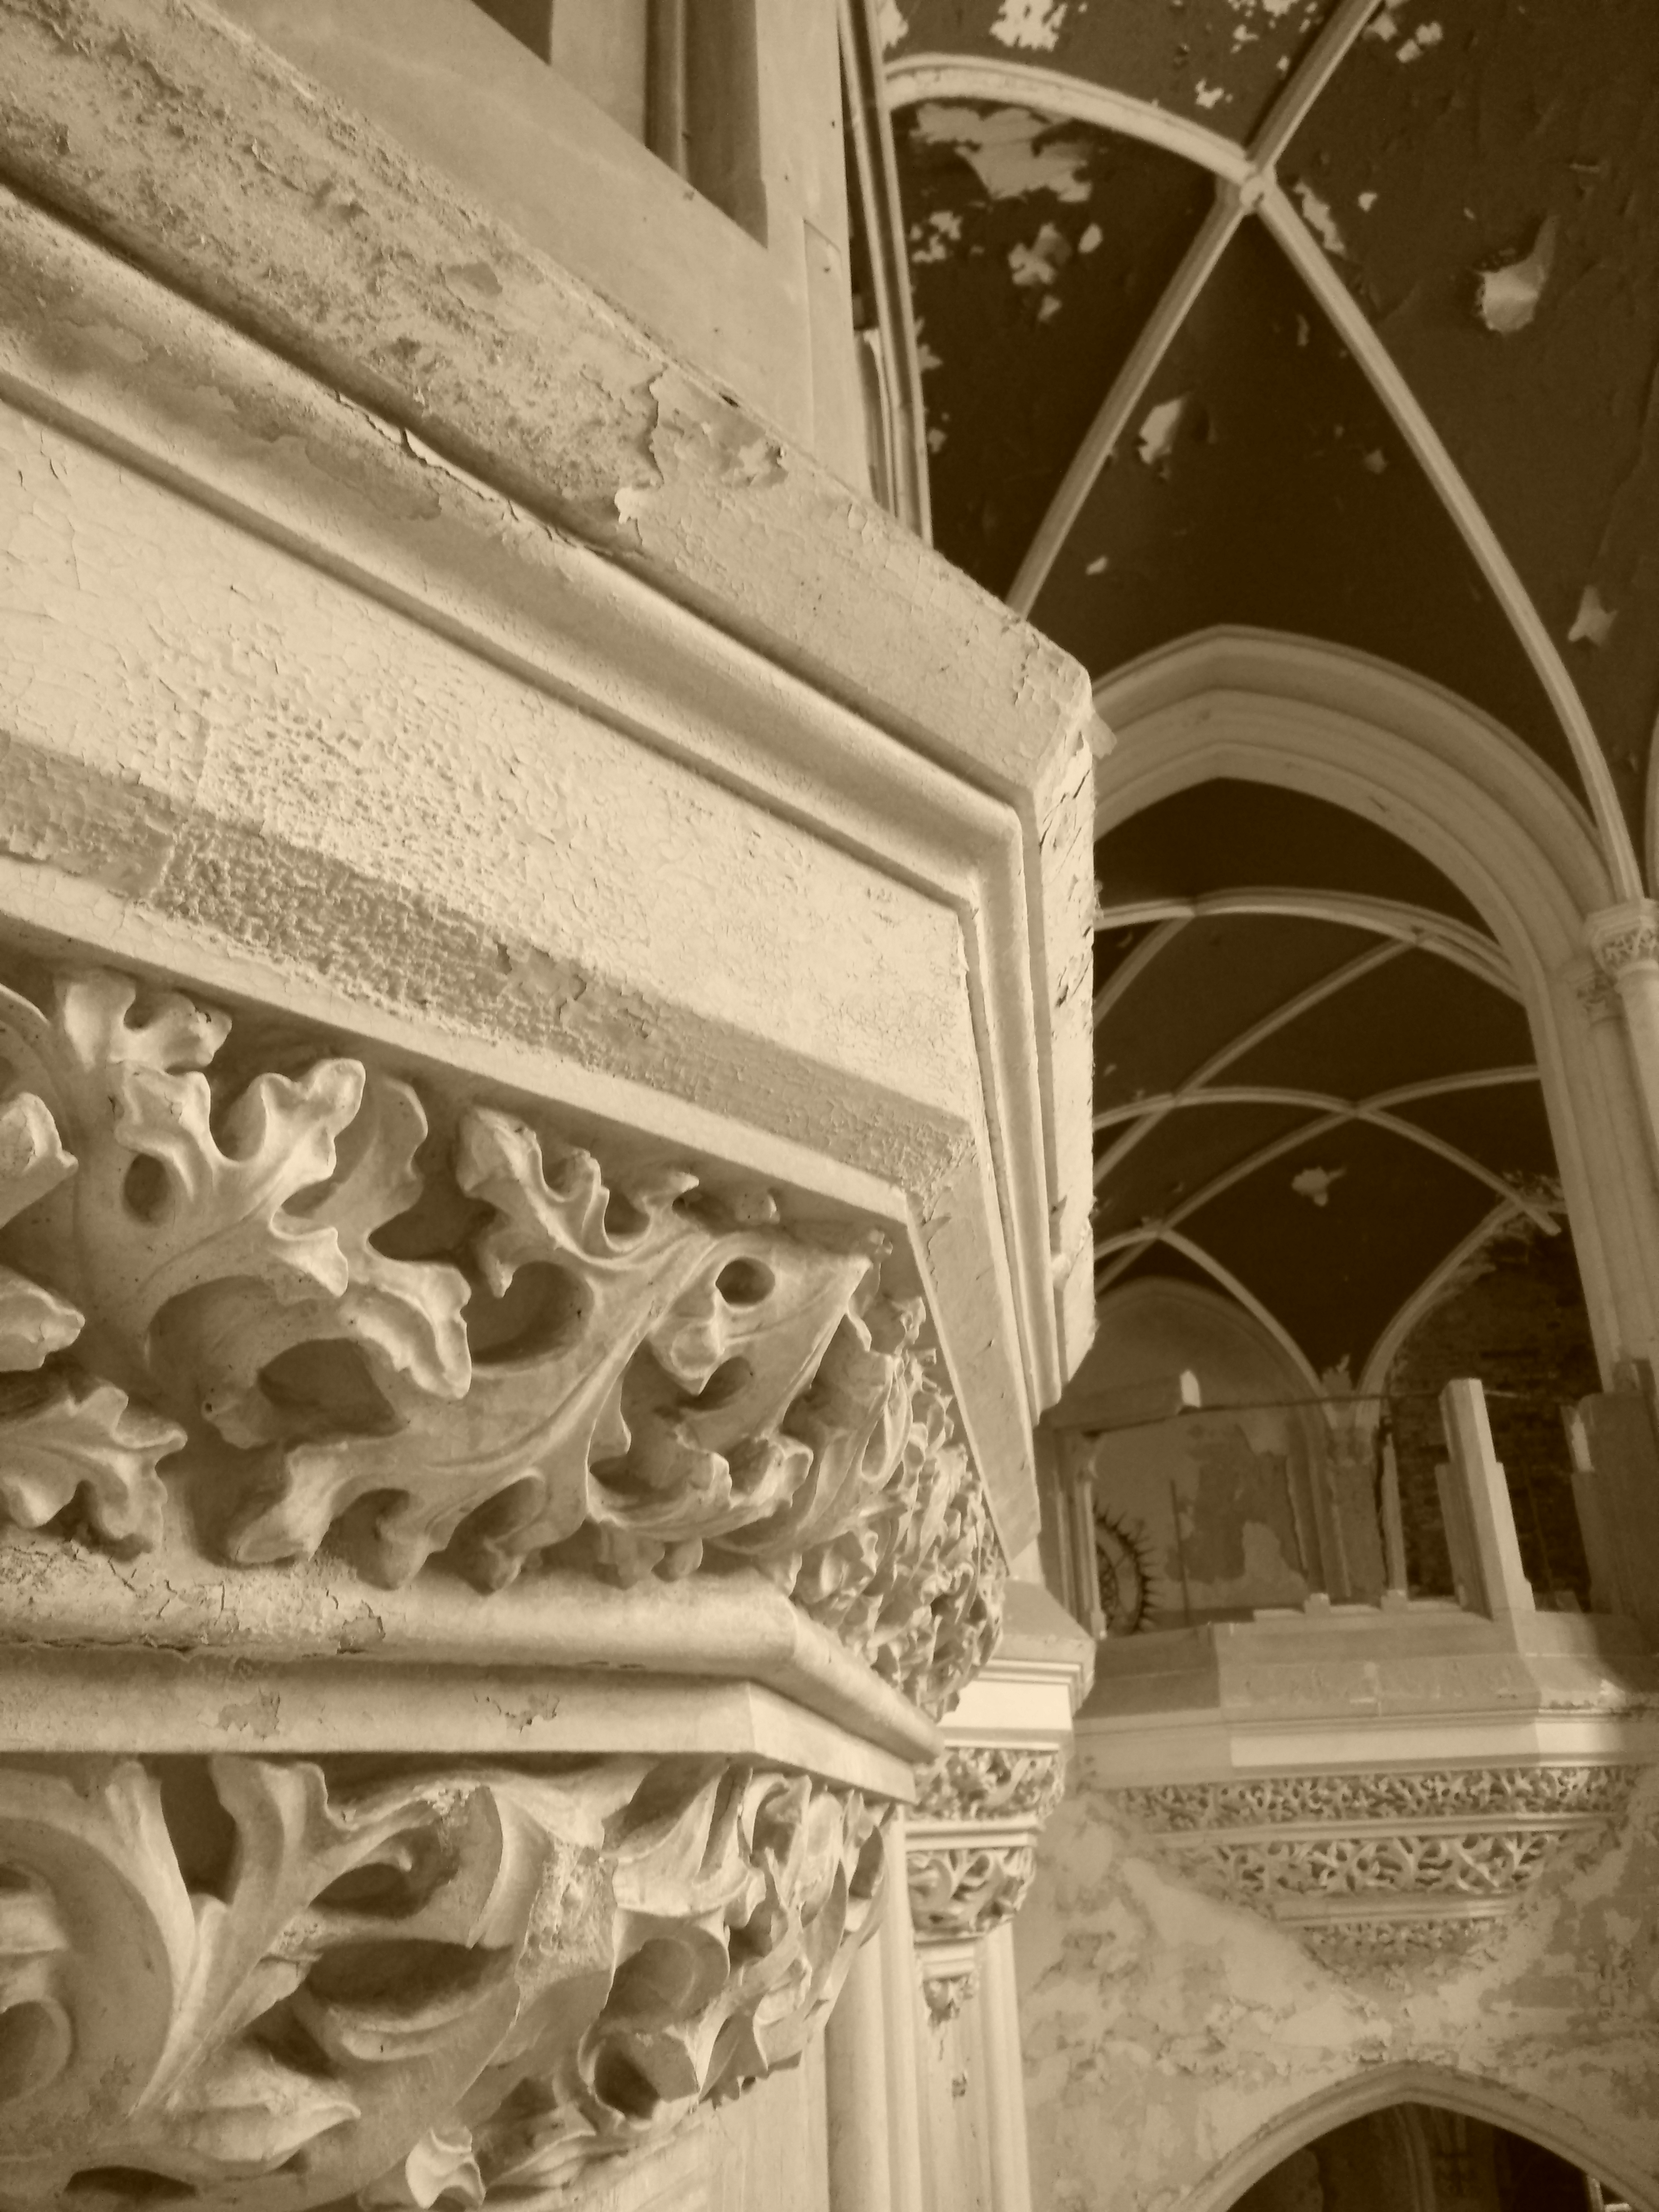 file:miranda castle decoration detail - wikimedia commons